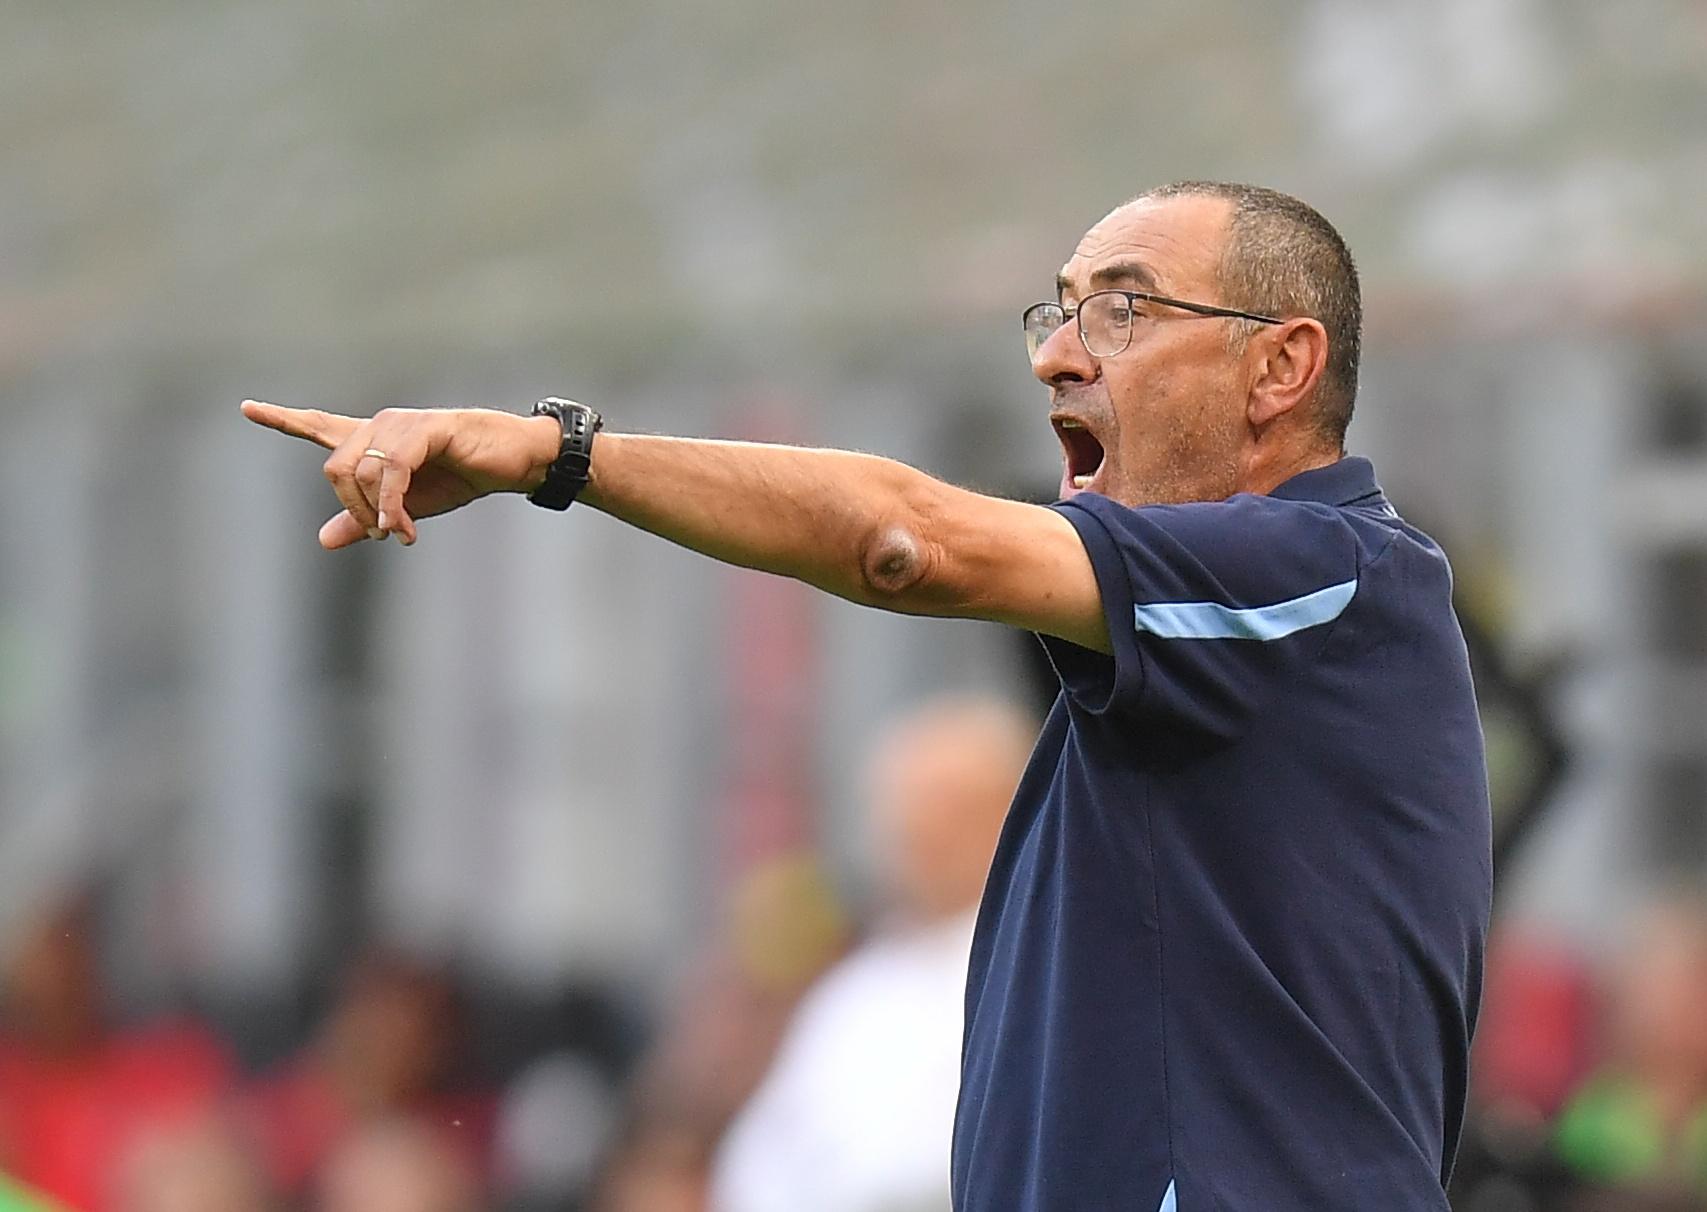 Soccer Football - Serie A - AC Milan v Lazio - San Siro, Milan, Italy - September 12, 2021 Lazio coach Maurizio Sarri reacts REUTERS/Daniele Mascolo